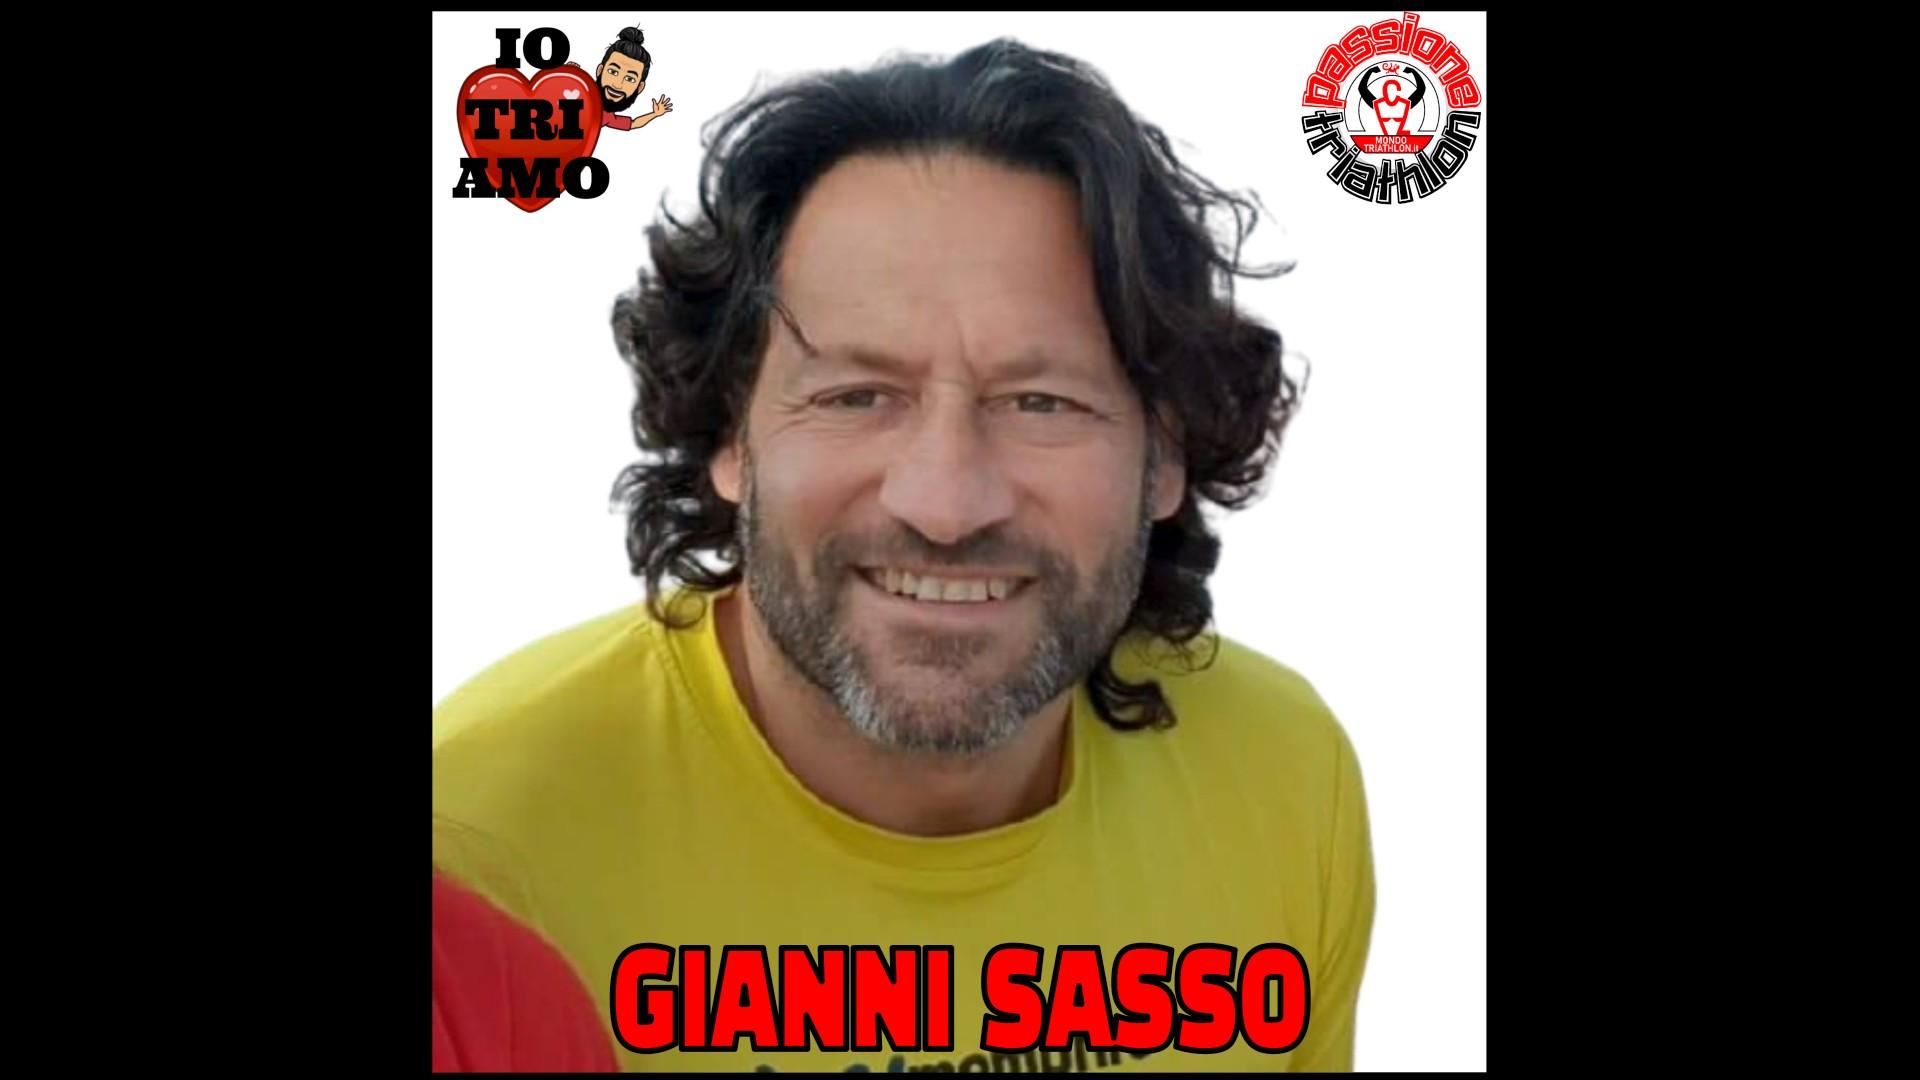 Gianni Sasso – Passione Triathlon n° 107